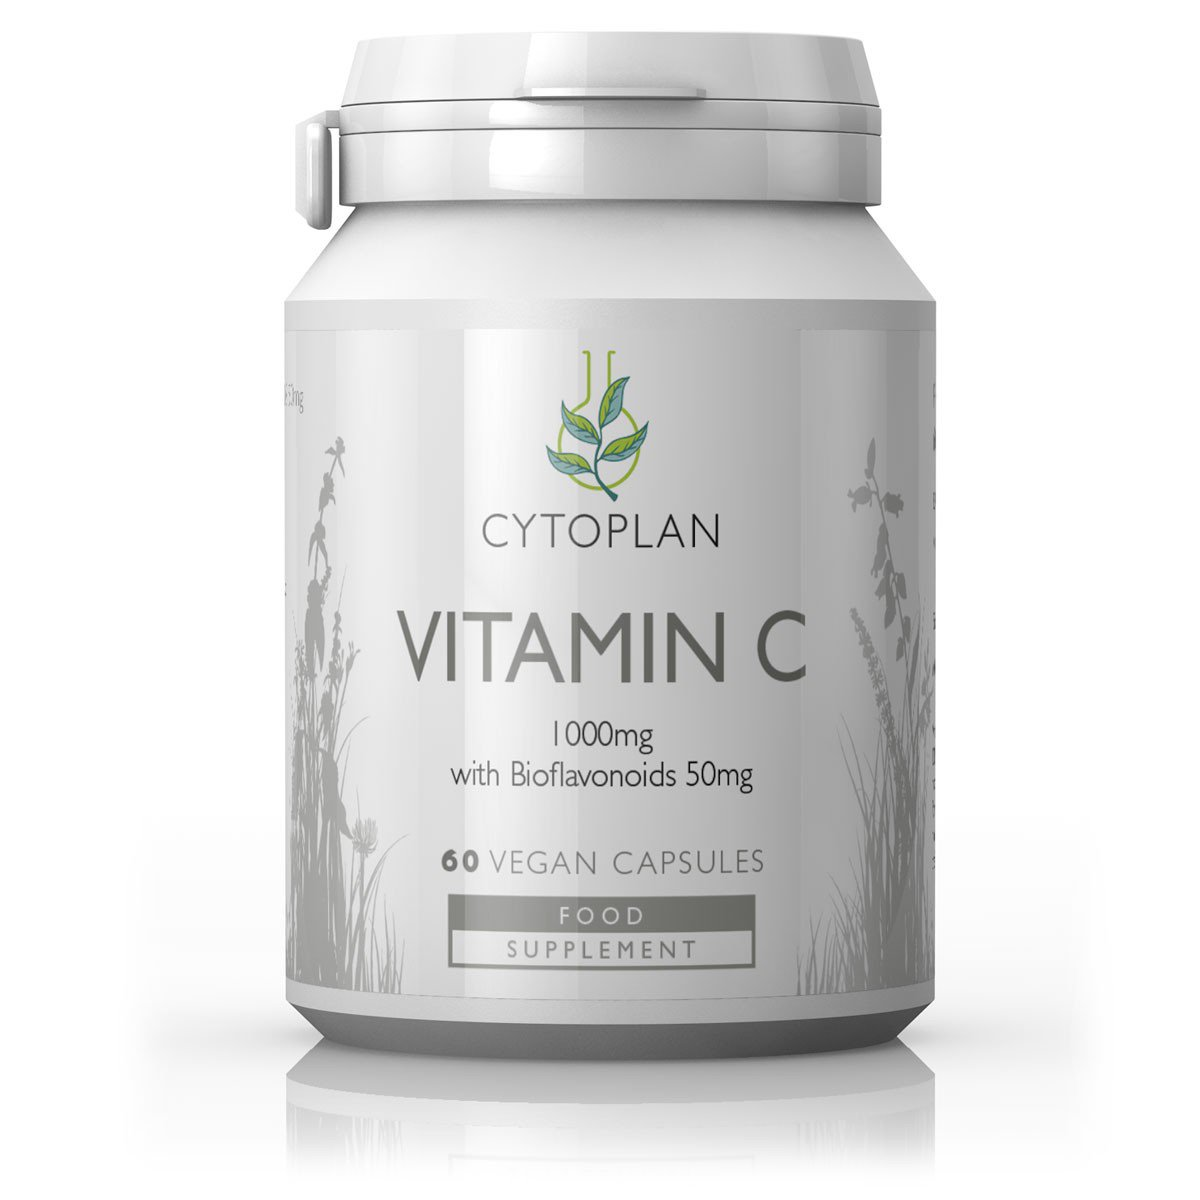 Vitamin C 1000mg with Bioflavanoids 50mg 60's